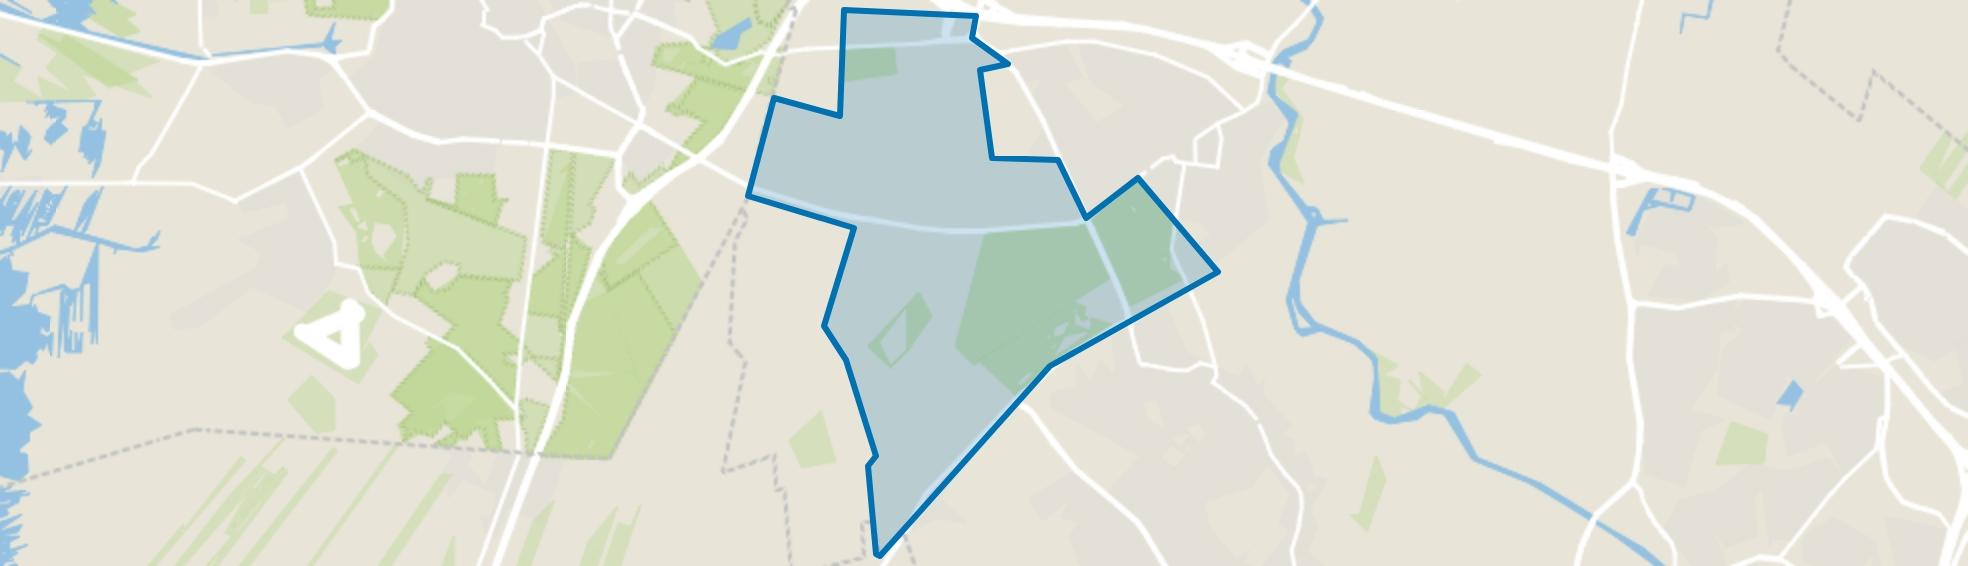 Verspreide huizen Baarn, Baarn map